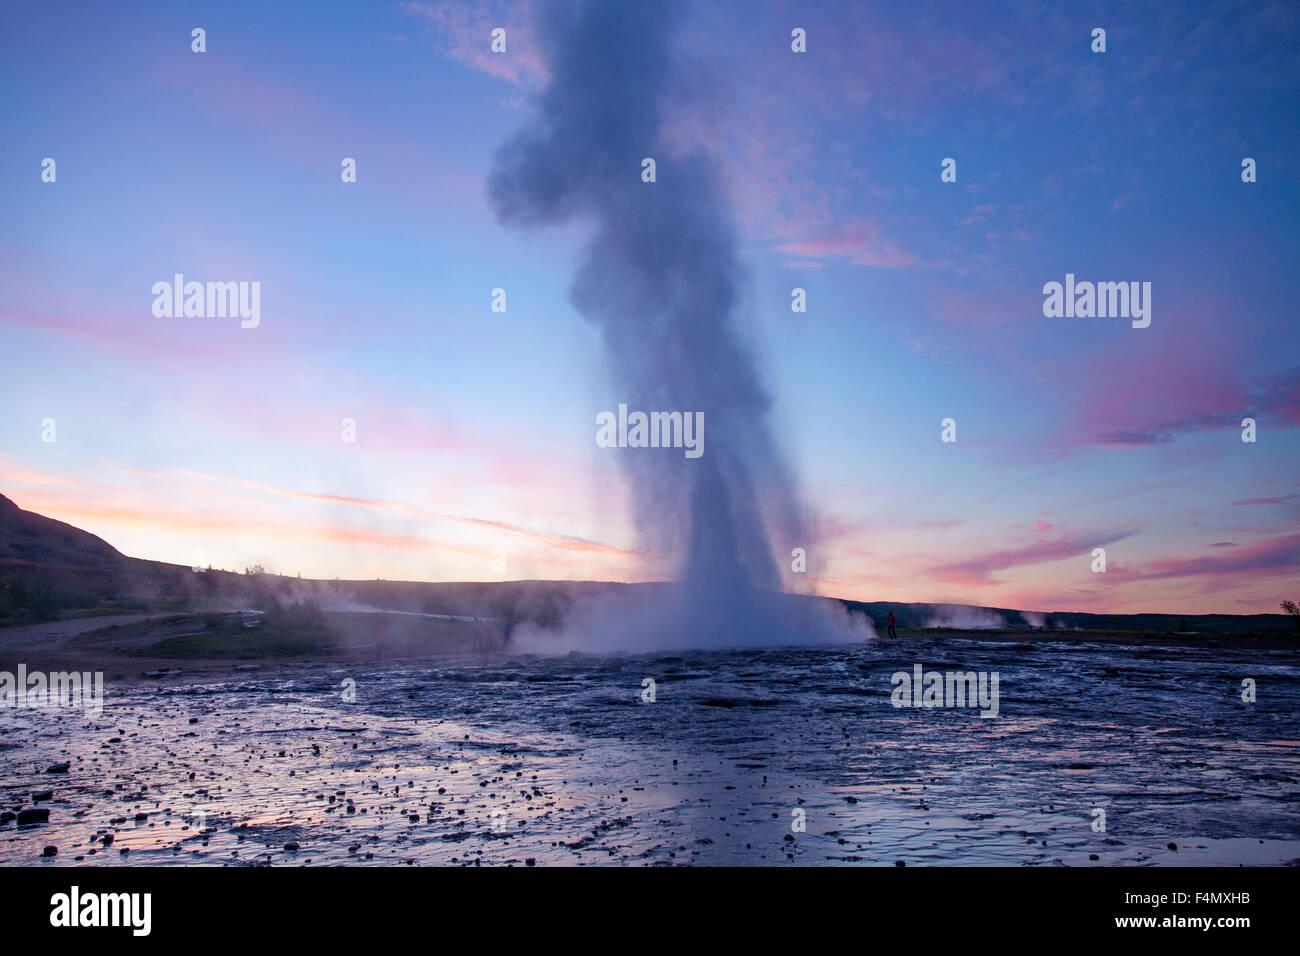 Strokkur geyser errupting at sunset, Geysir, Sudhurland, Iceland. - Stock Image